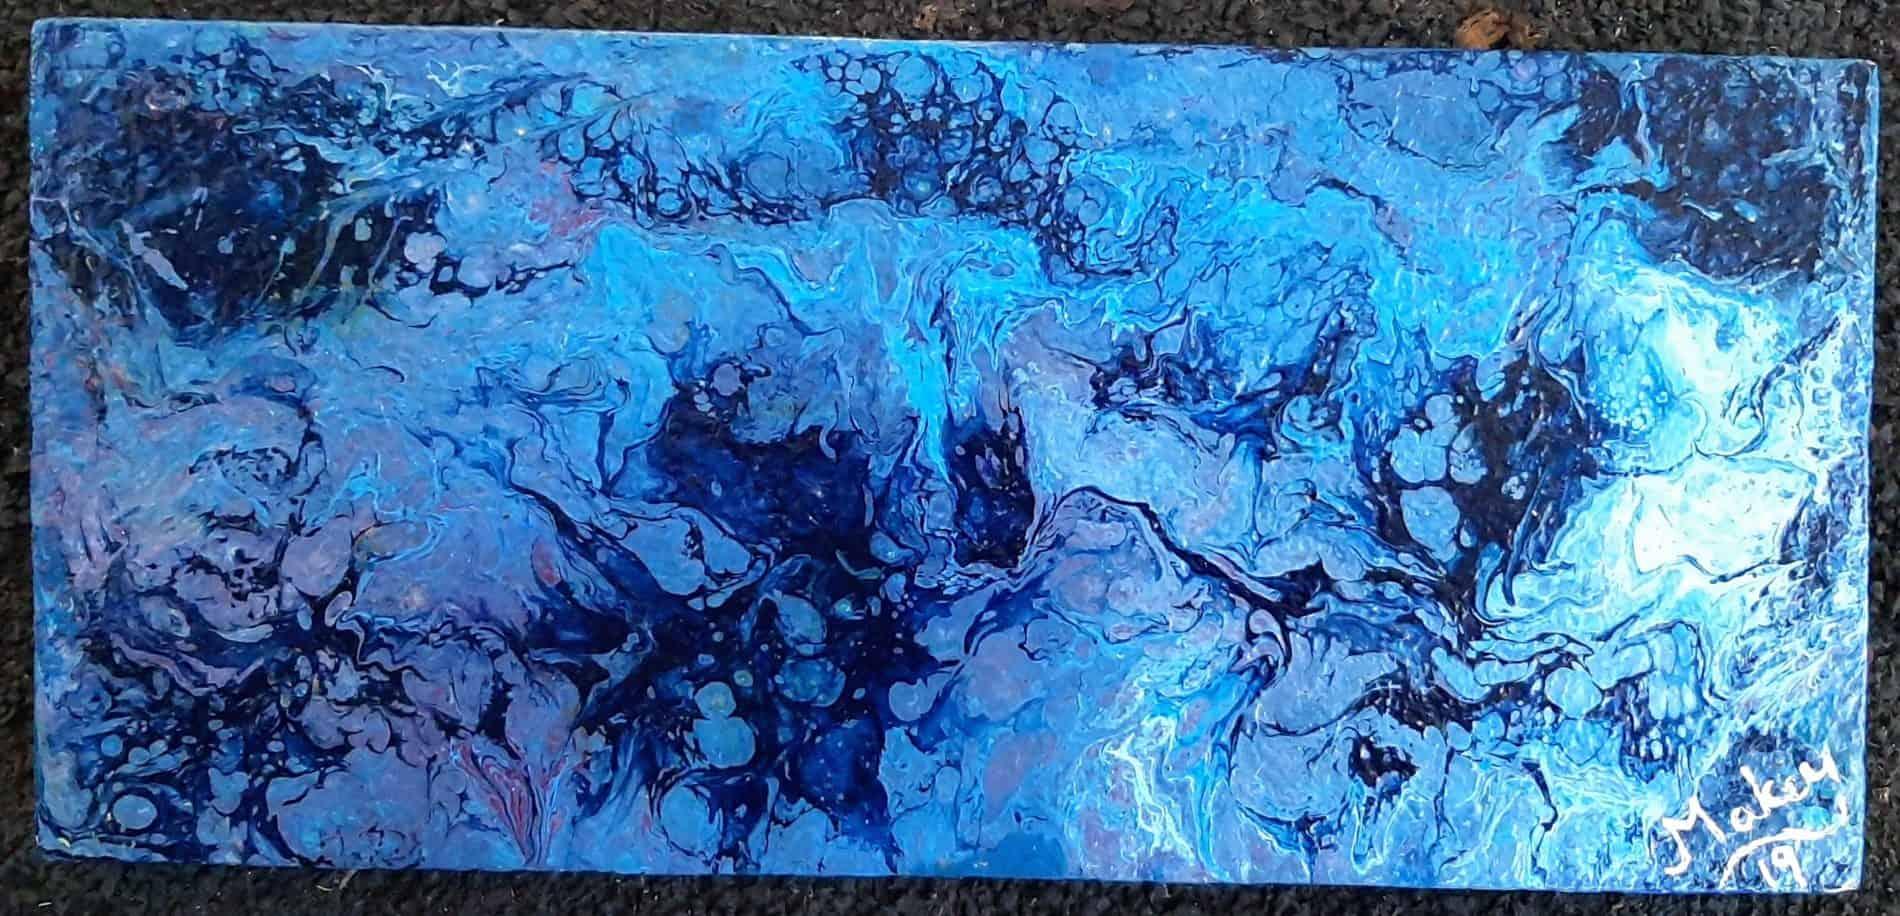 mauritian-artist-yusuf-makey-abstract-blue-1